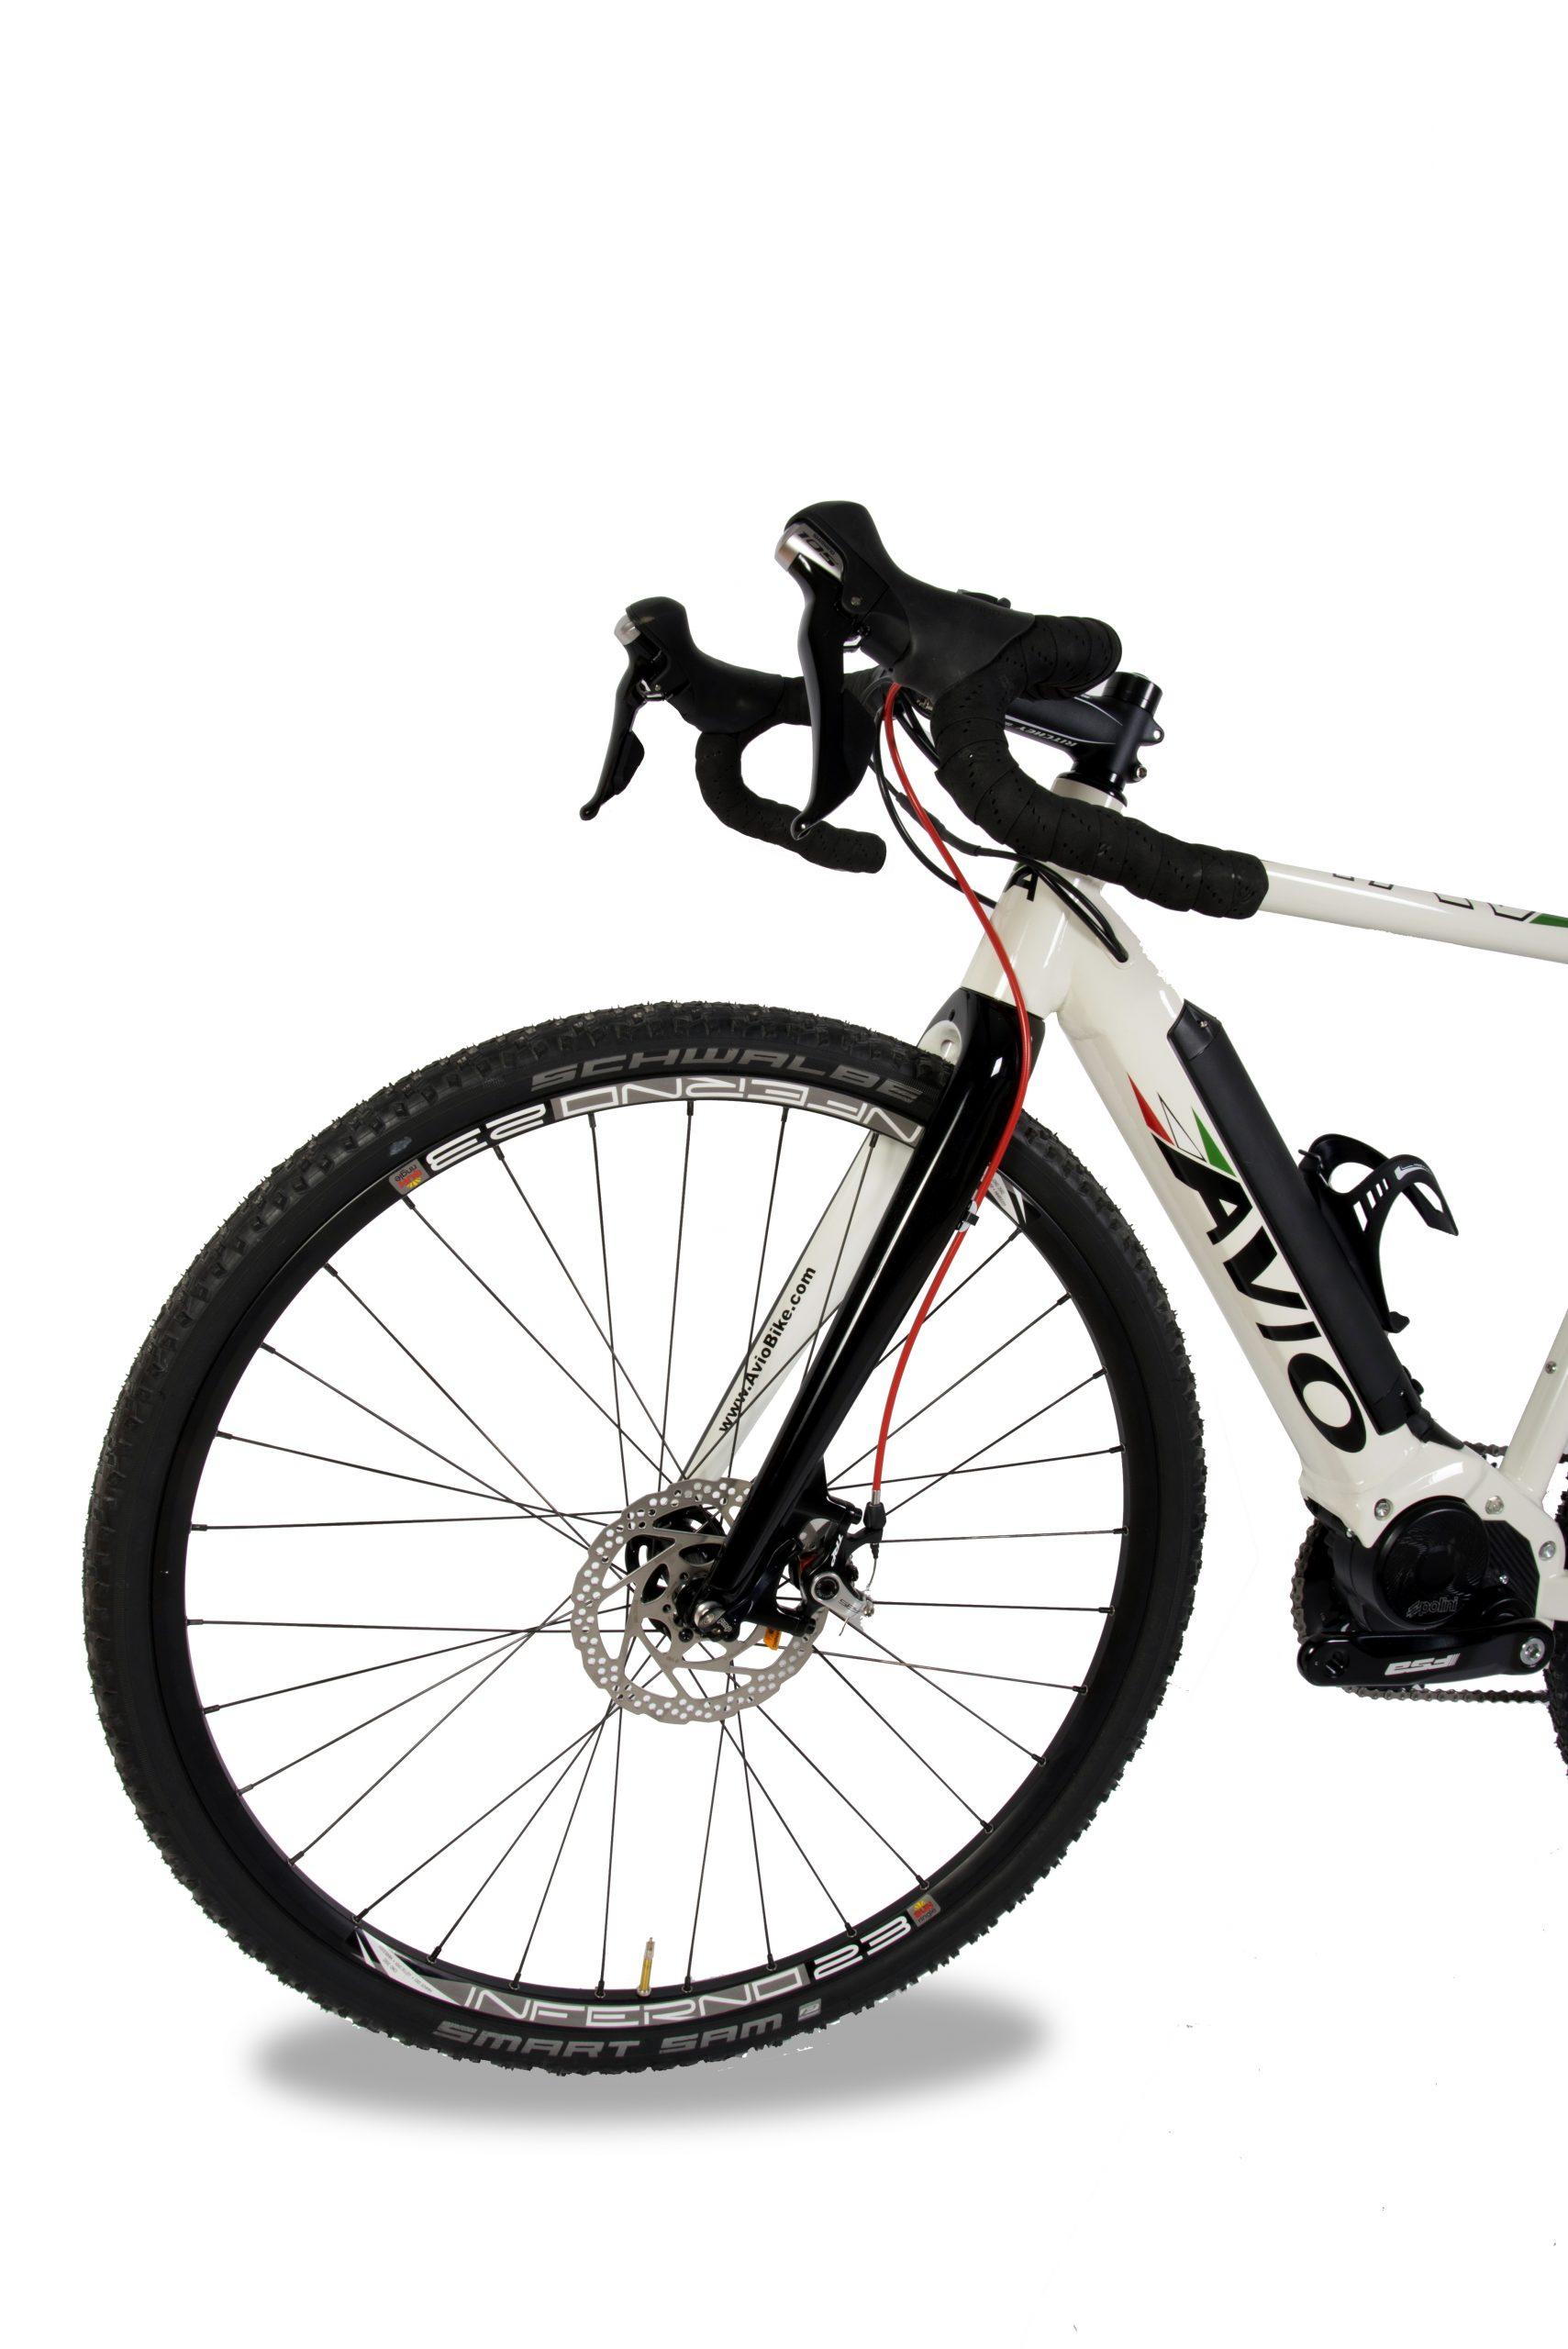 Aviobike Angelo Allevi bicicletta elettrica C-172 Gravel